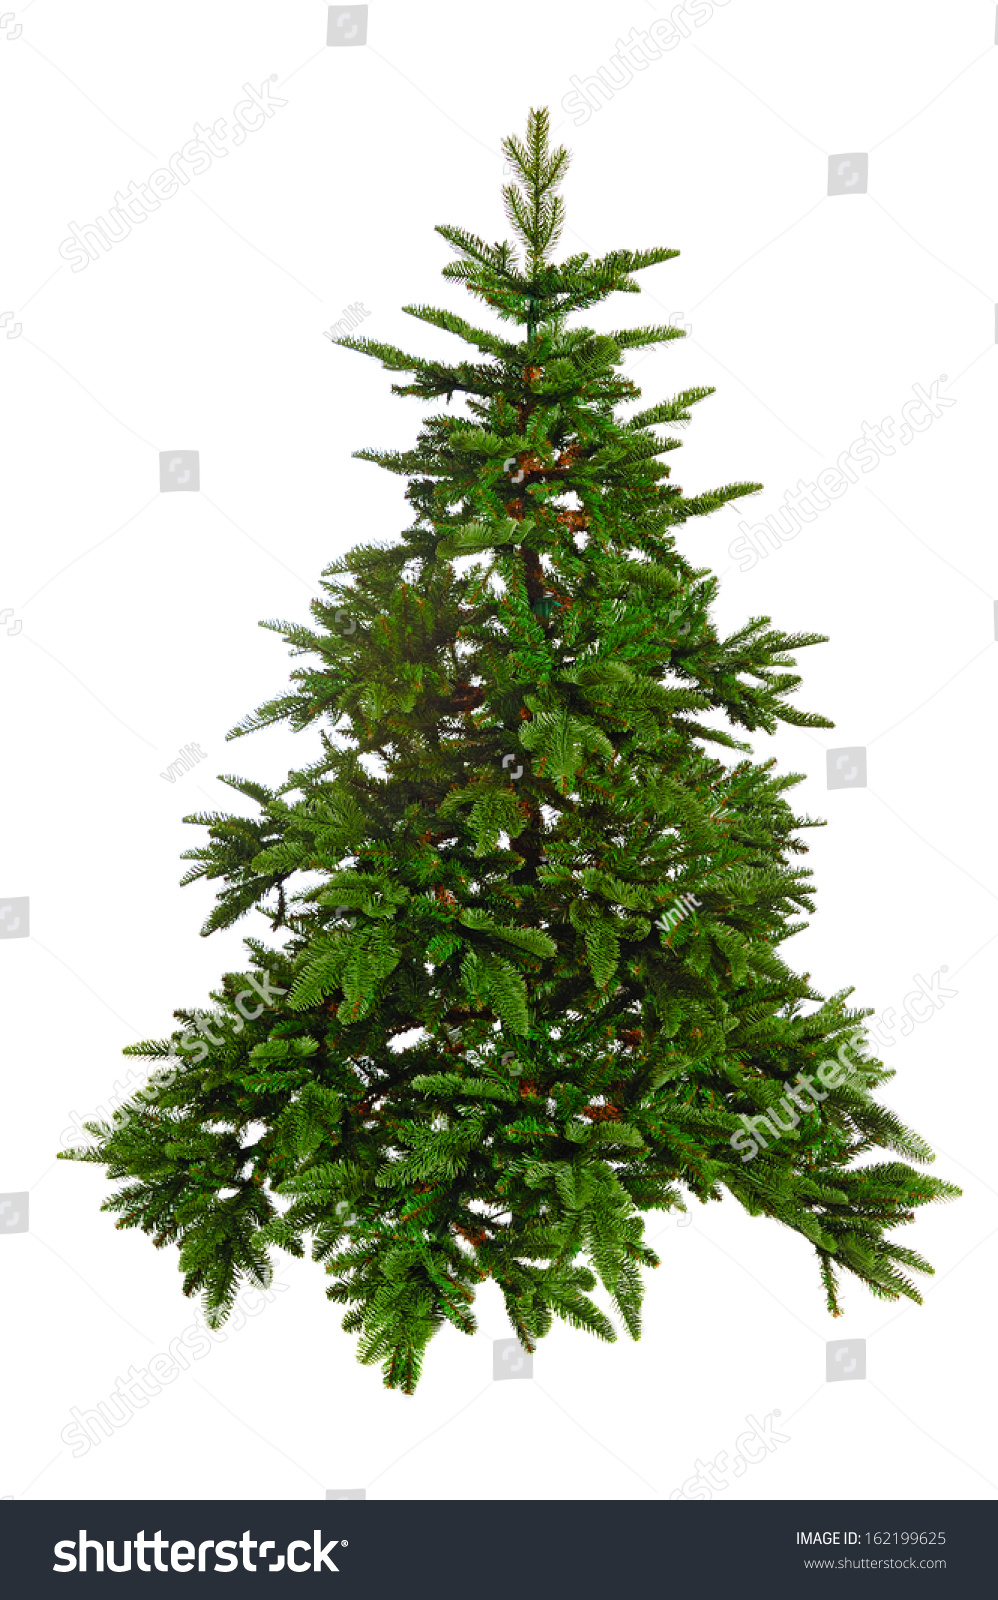 Stock Photo Bare Christmas Tree Isolated On White Background